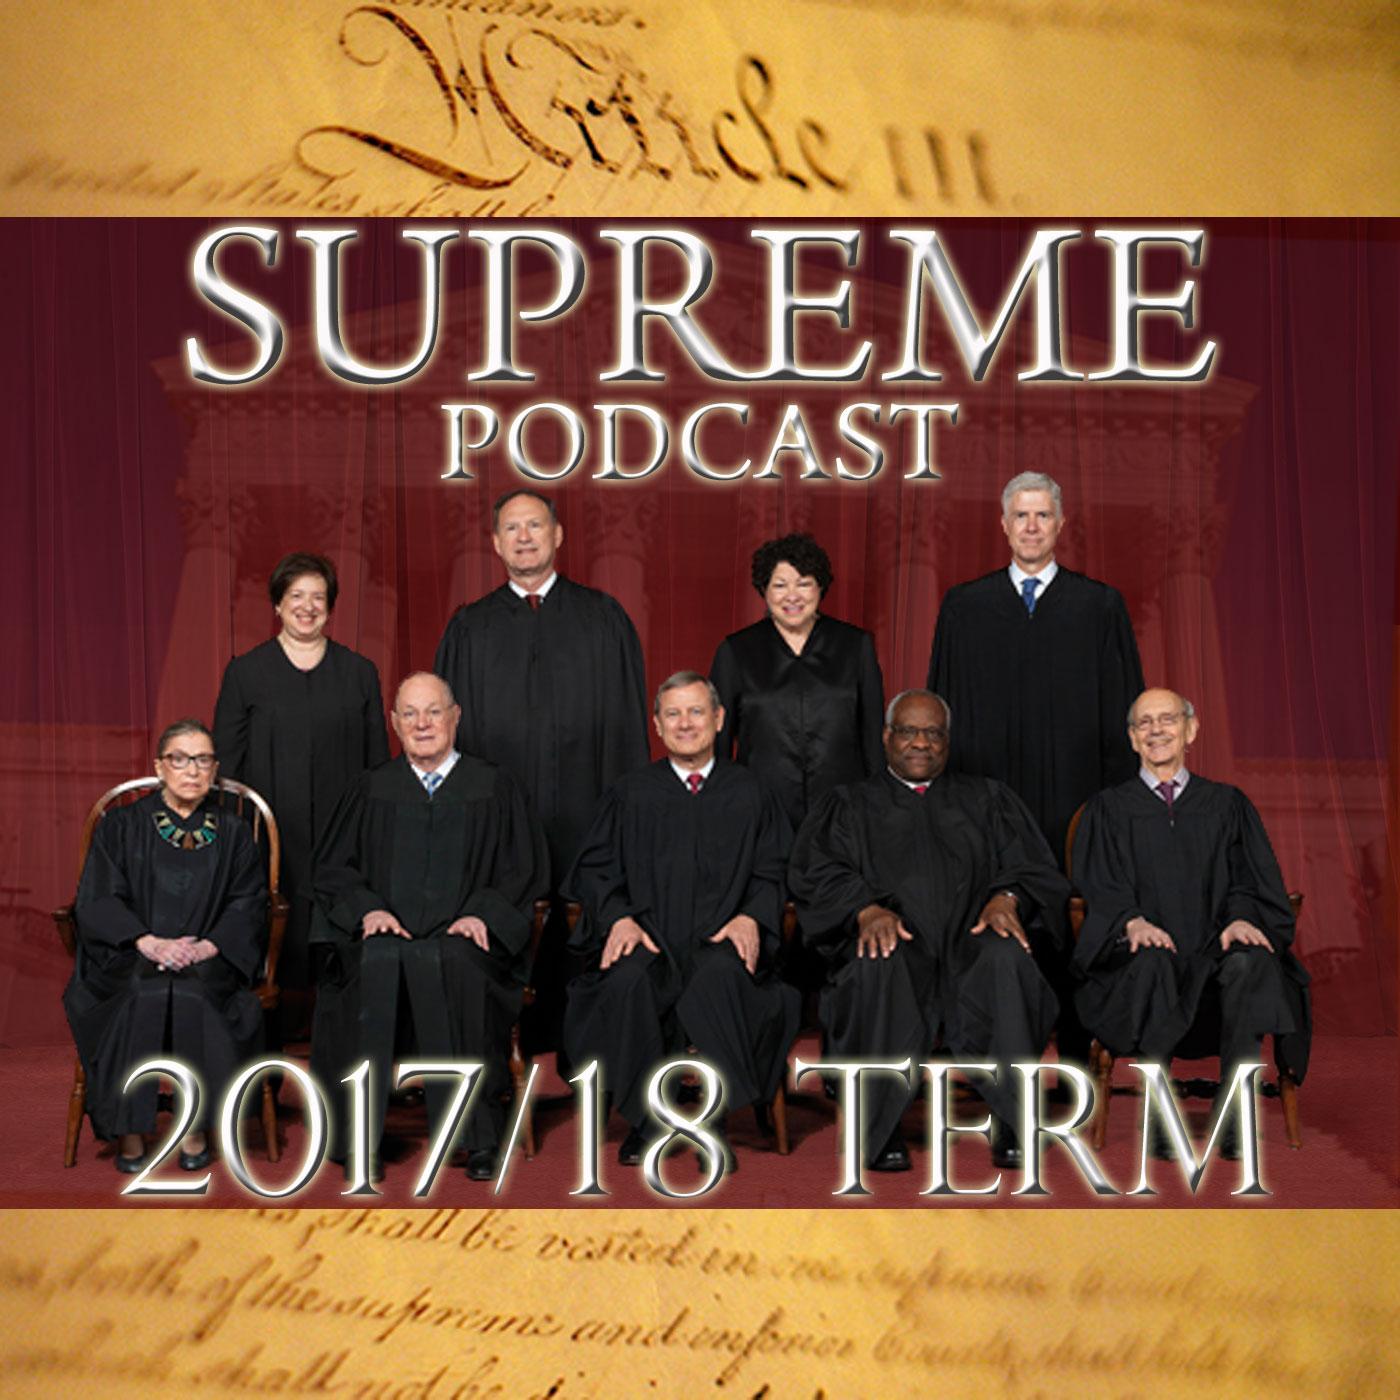 Supreme Podcast